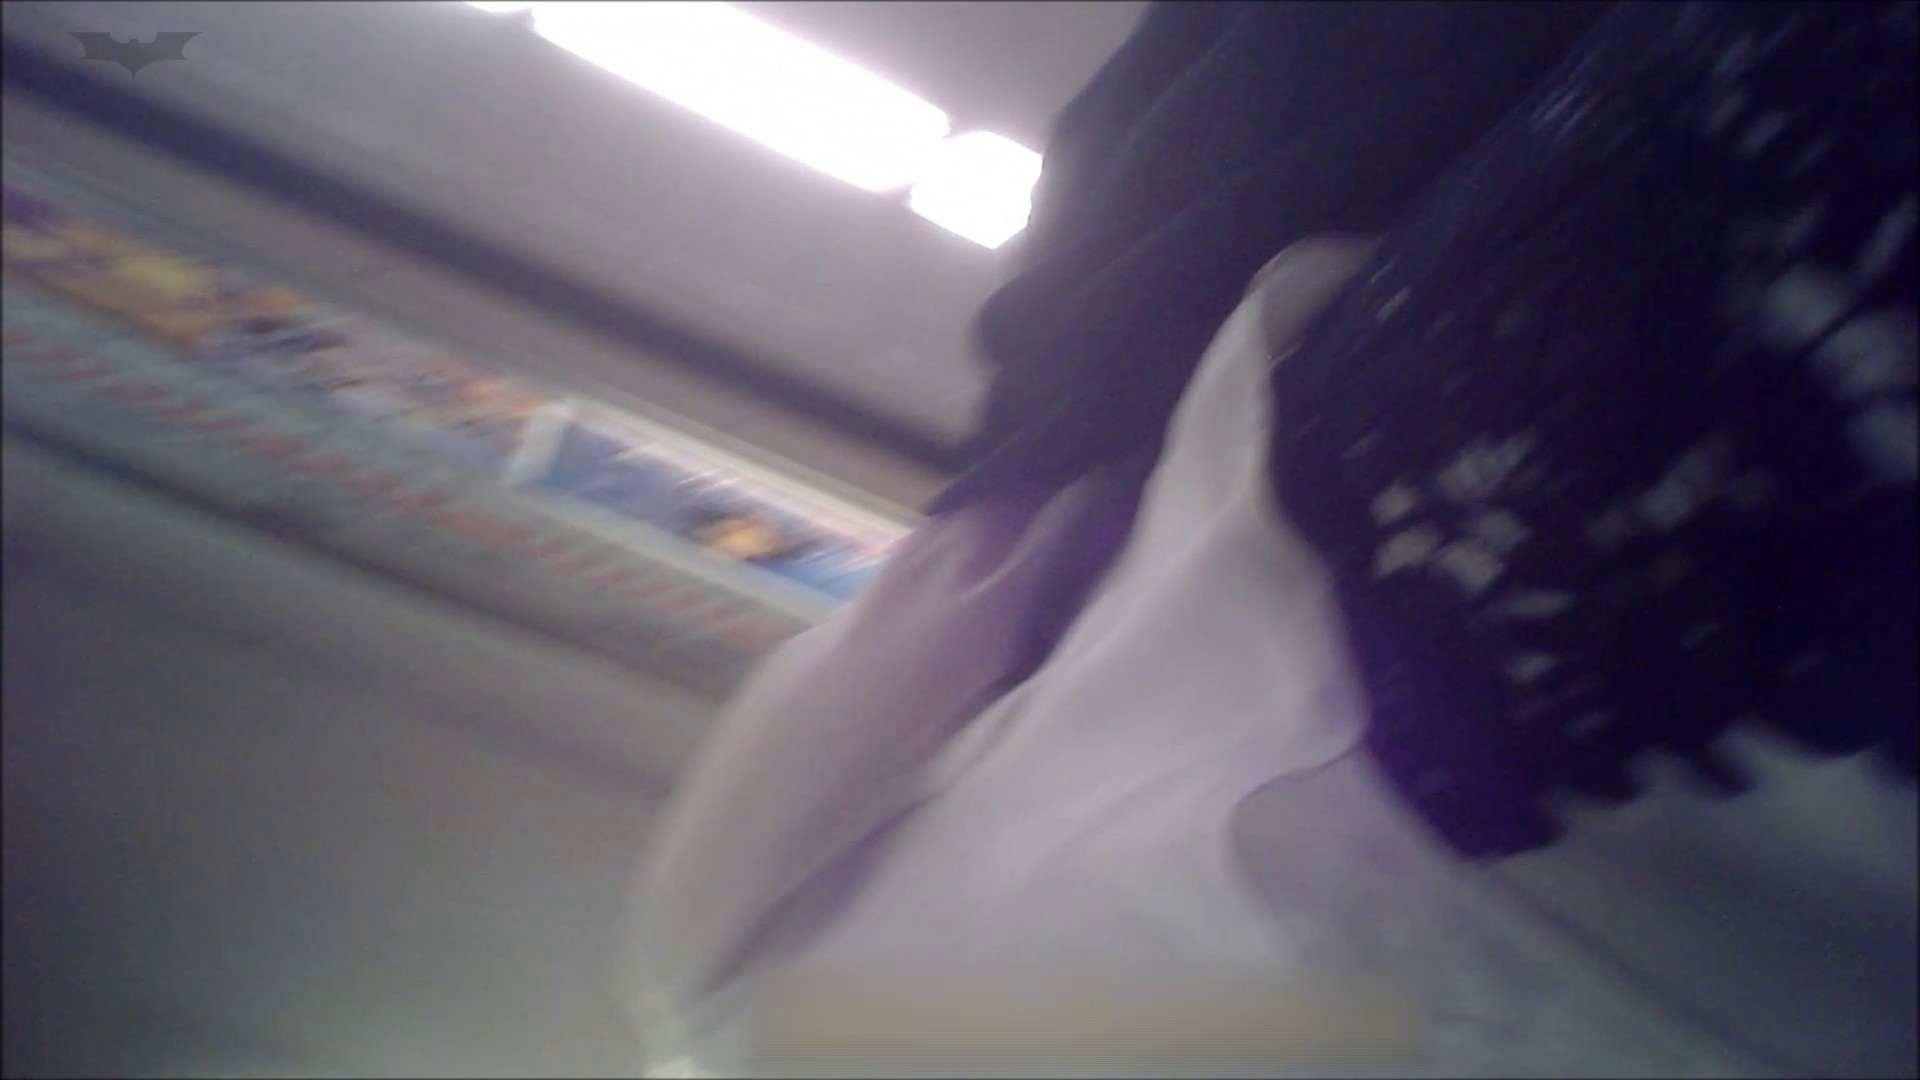 美人店員パンチラ盗撮Vol.09 高評価 | 細身体型  93枚 91